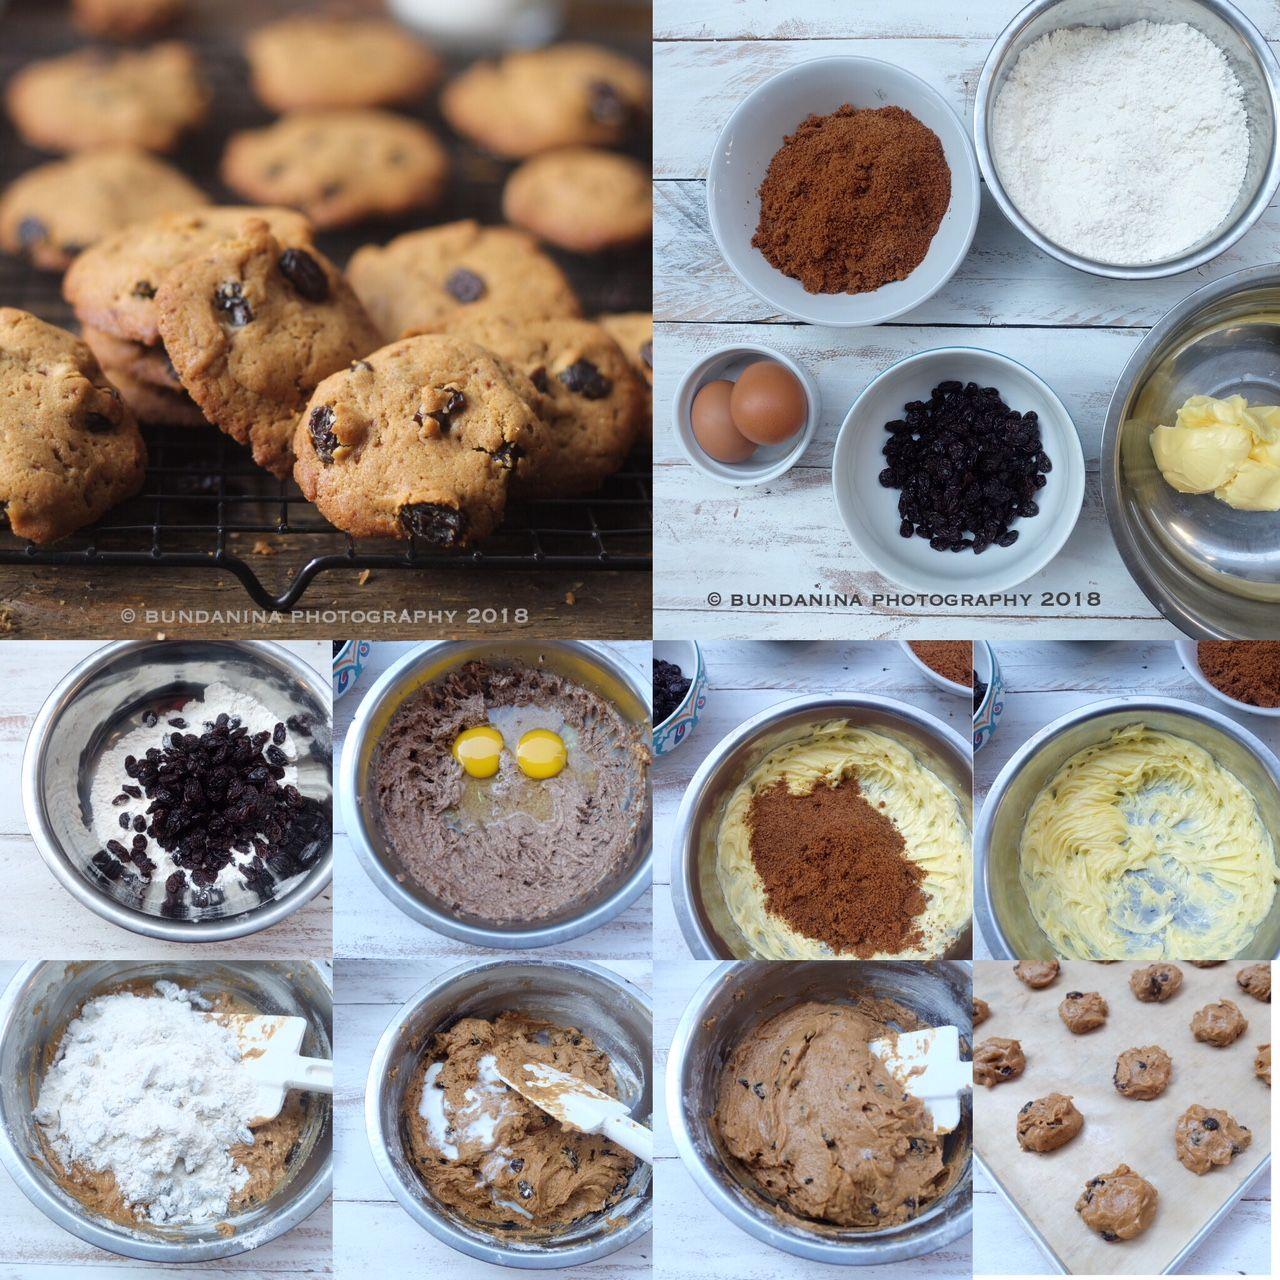 Raisin Cookies Kue Kering Kismis Catatan Nina Kue Kering Kue Lebar Kismis